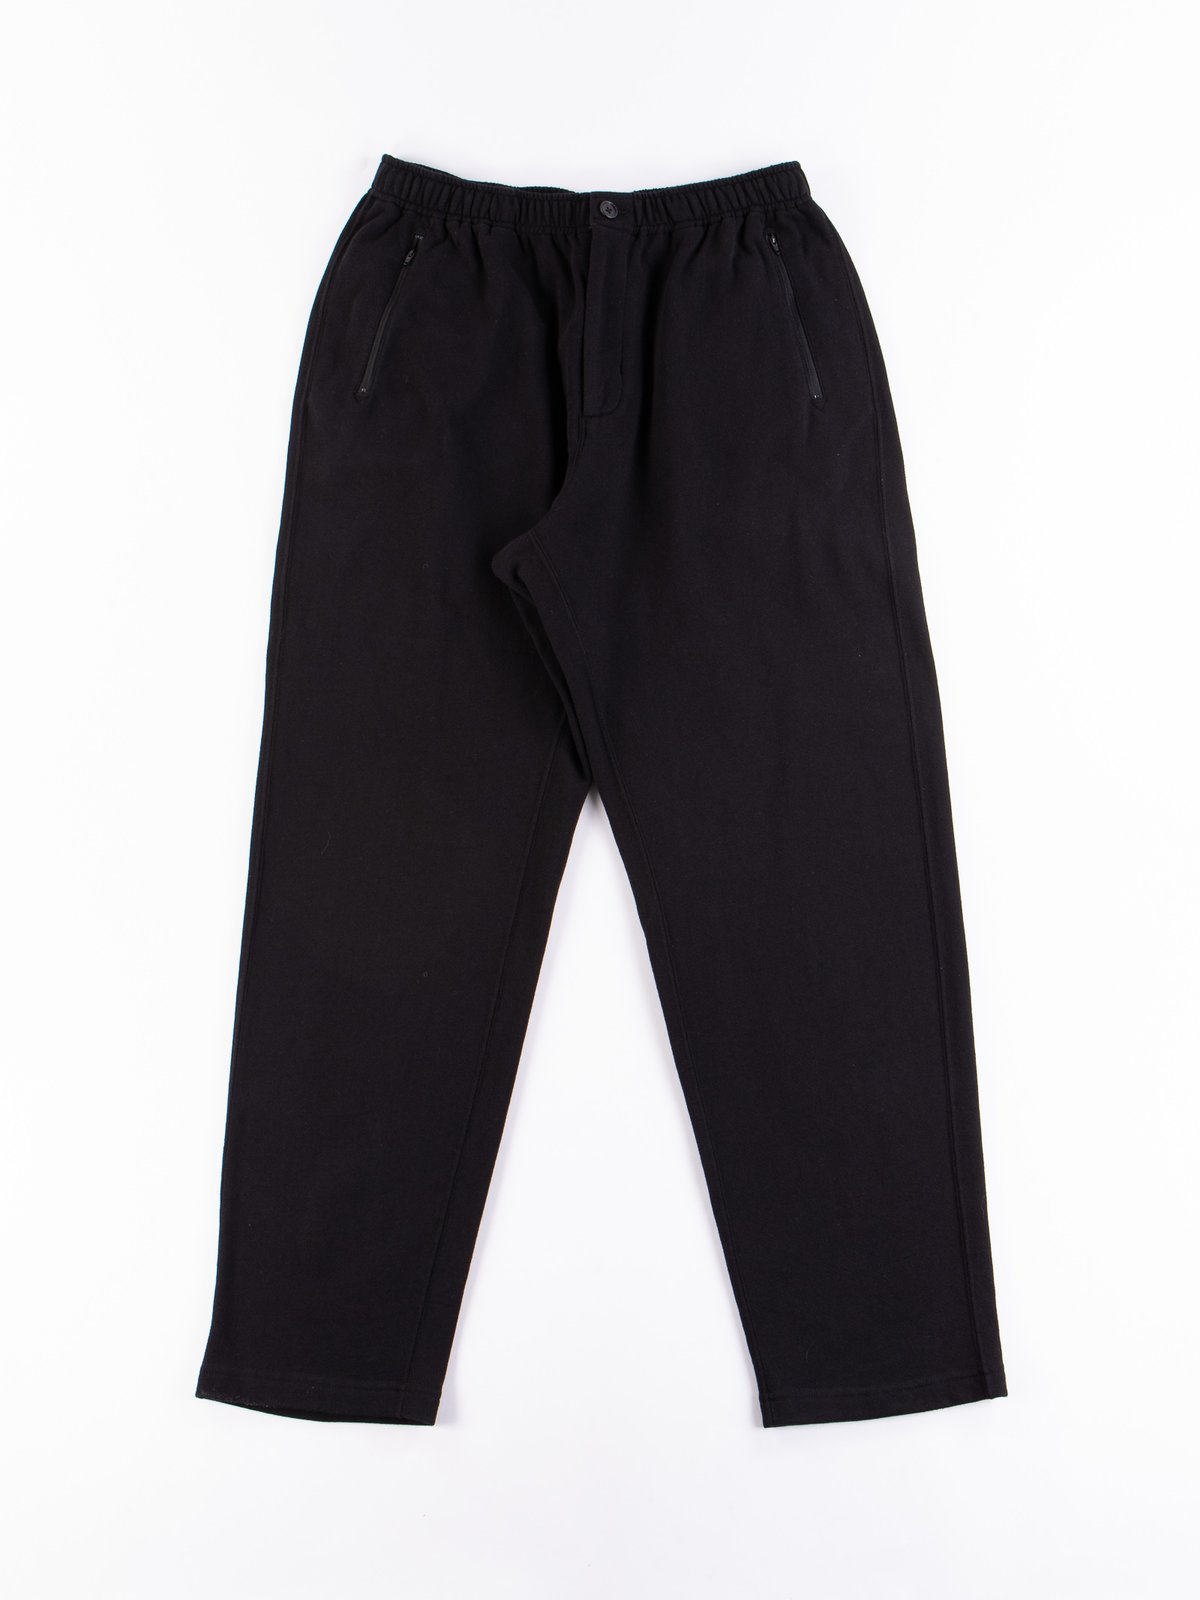 Black Jog Pant - Image 1